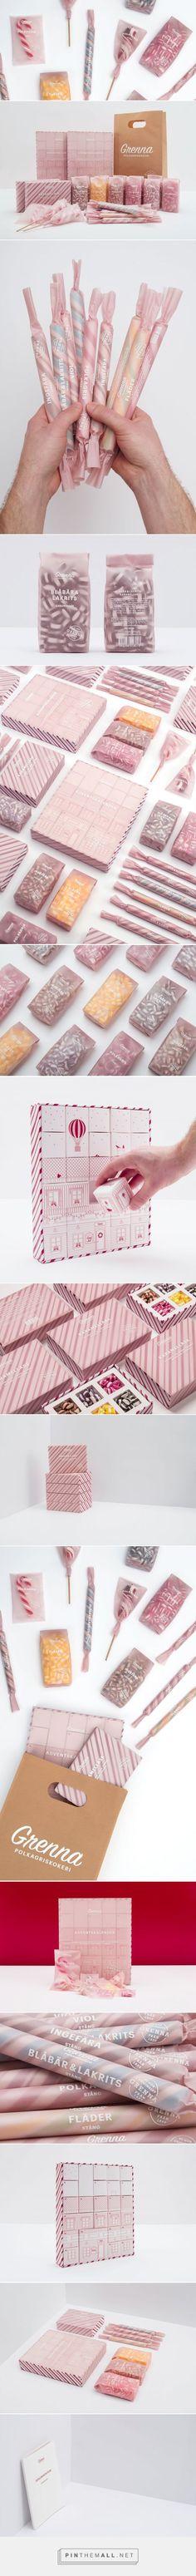 Candy Packaging - Grenna Polkagriskokeri